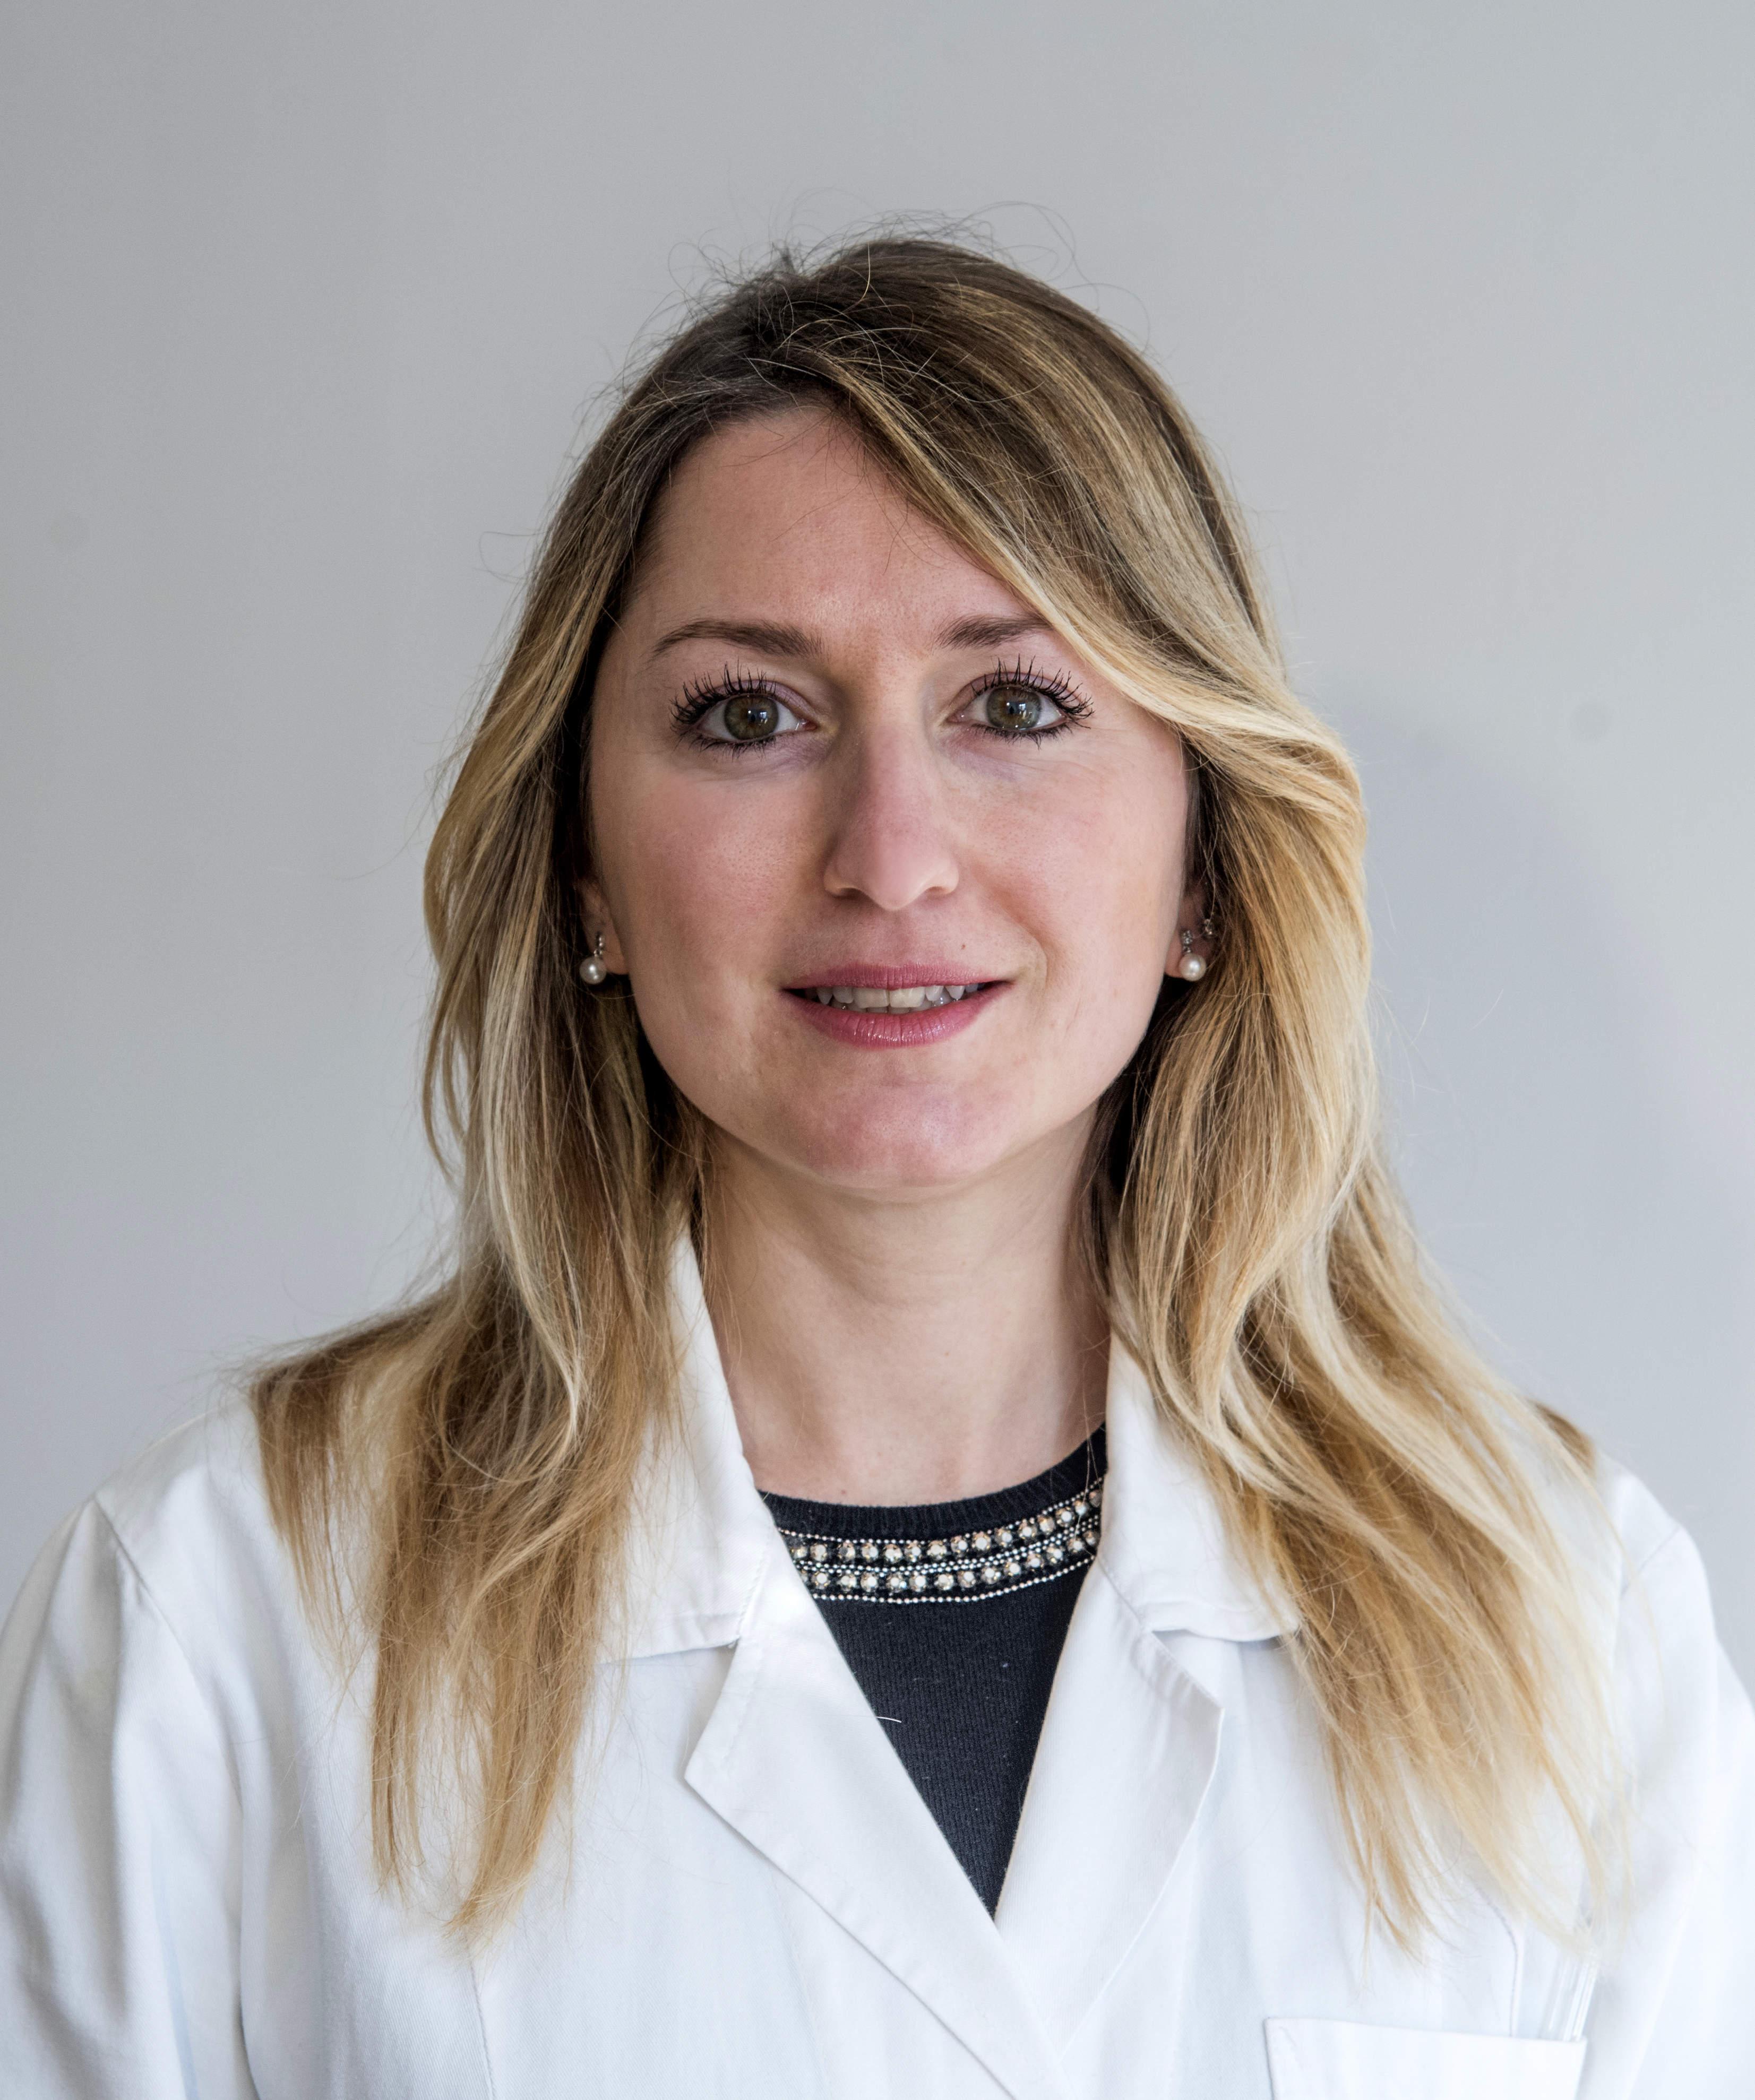 Manuela Accardi